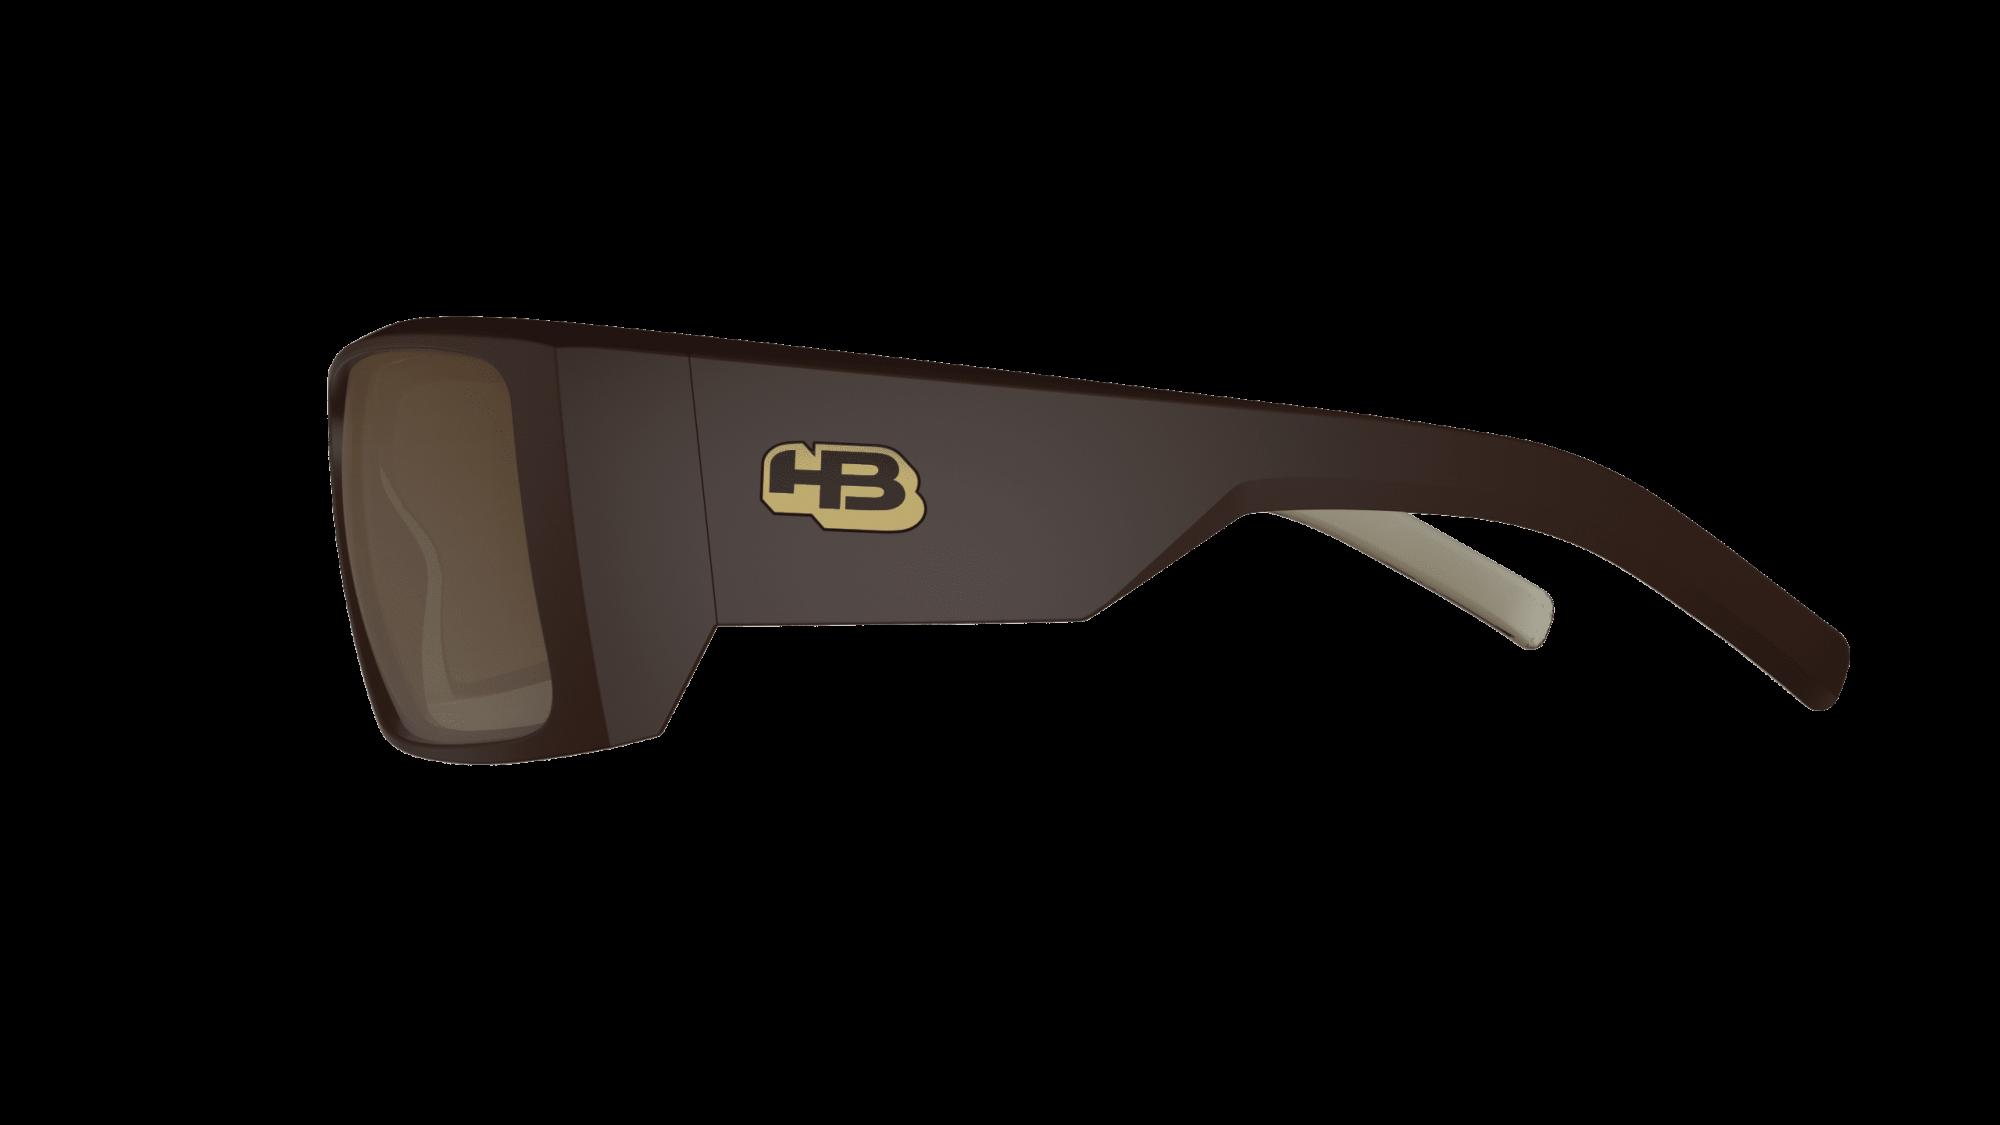 Óculos Rocker 2.0 Hb Matte Café Bege Brown